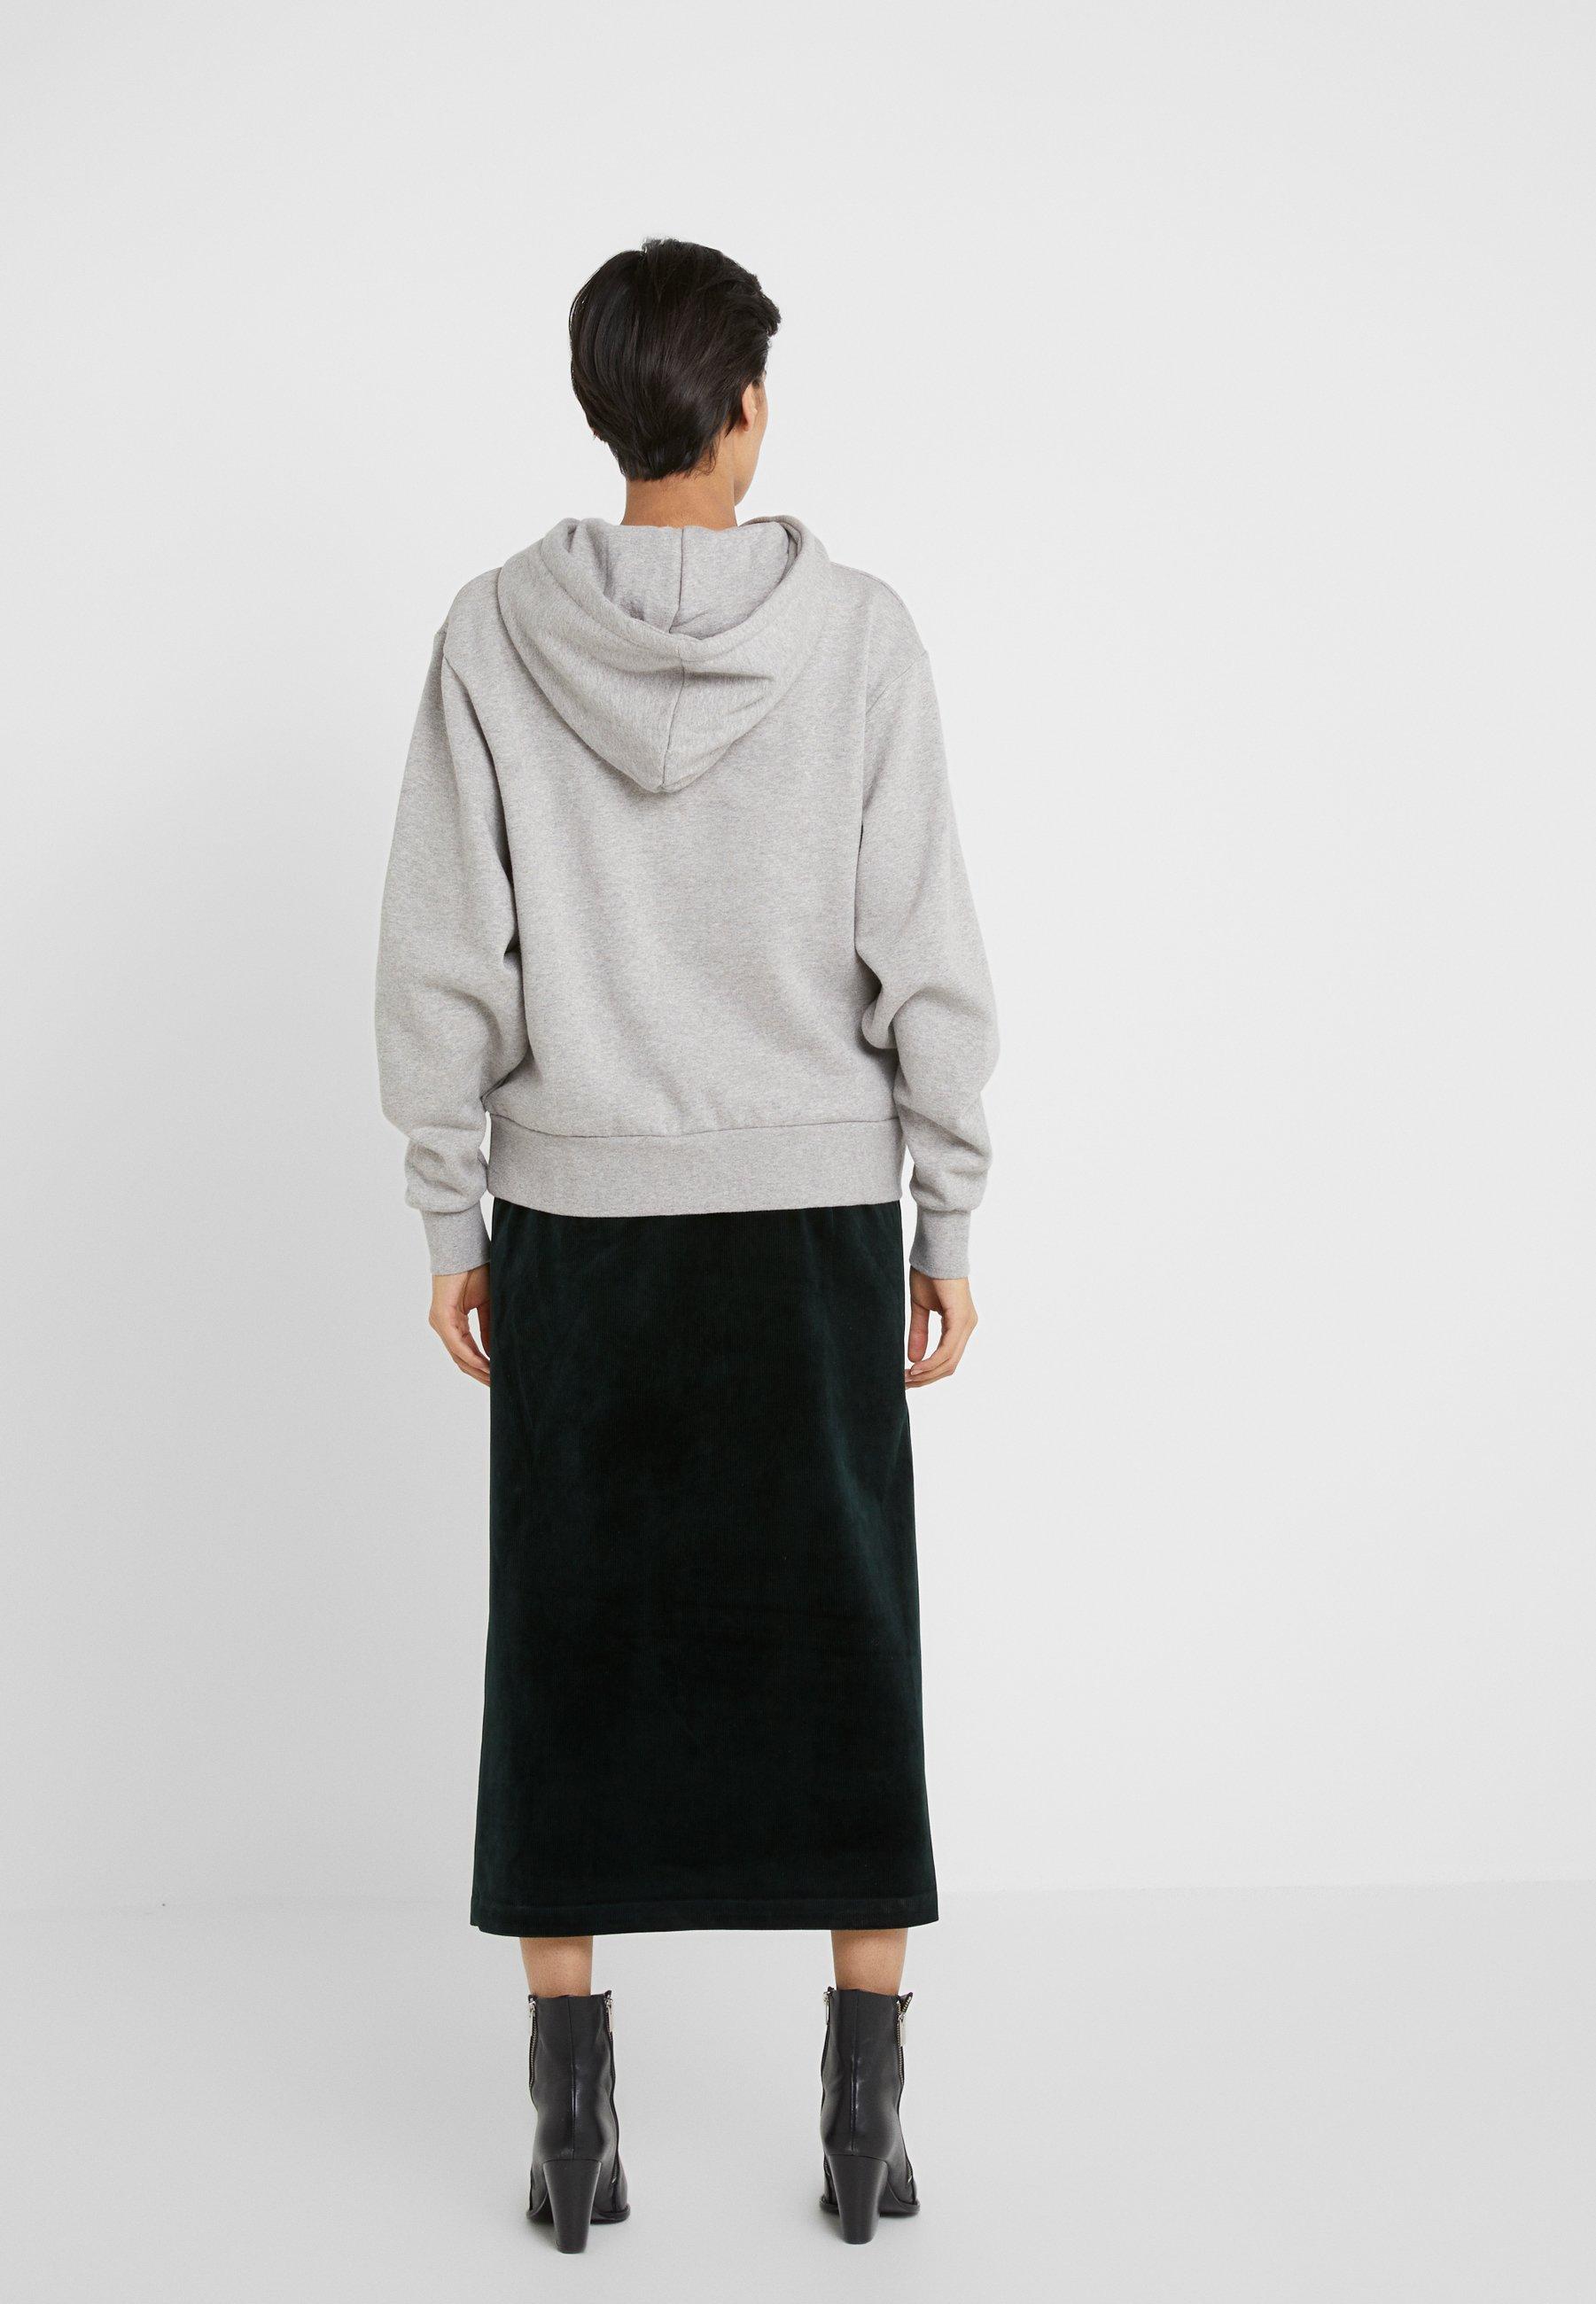 Han Kjobenhavn BULKY HOODIE - Sweat à capuche - dark grey - Pulls & Gilets Femme NdnXN